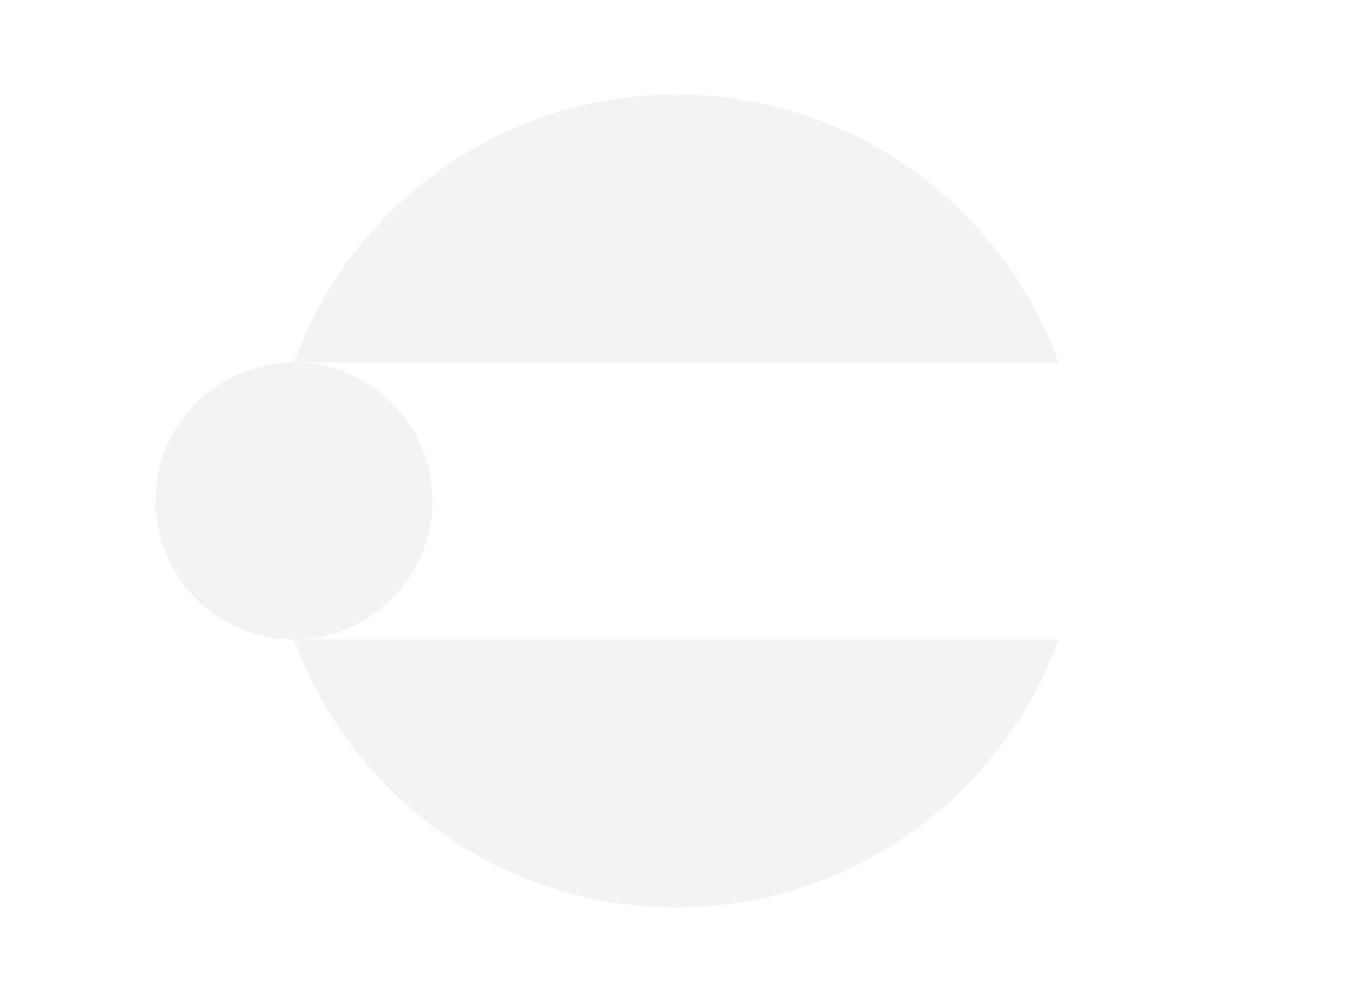 XAOC Devices Logo Shirt (Black) - S